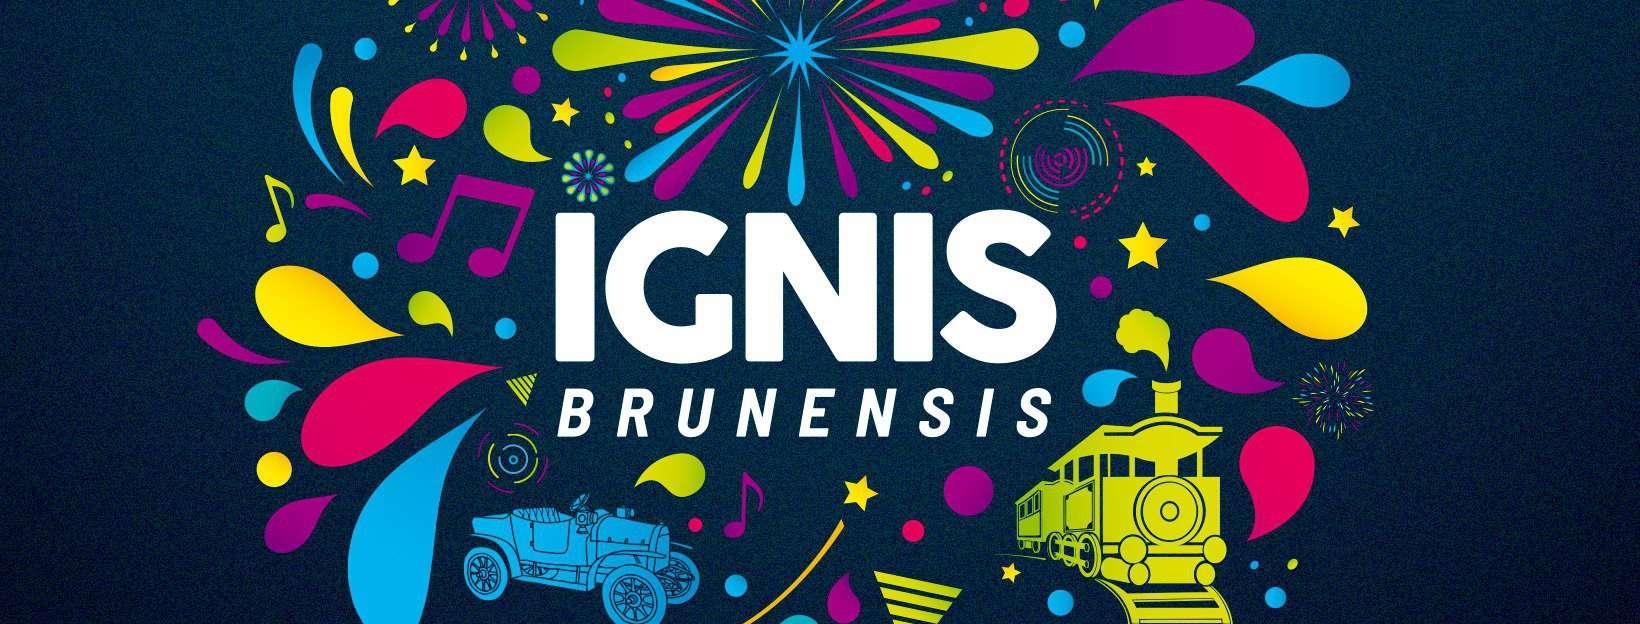 Ignis Brunensis Ohňostroje Brno